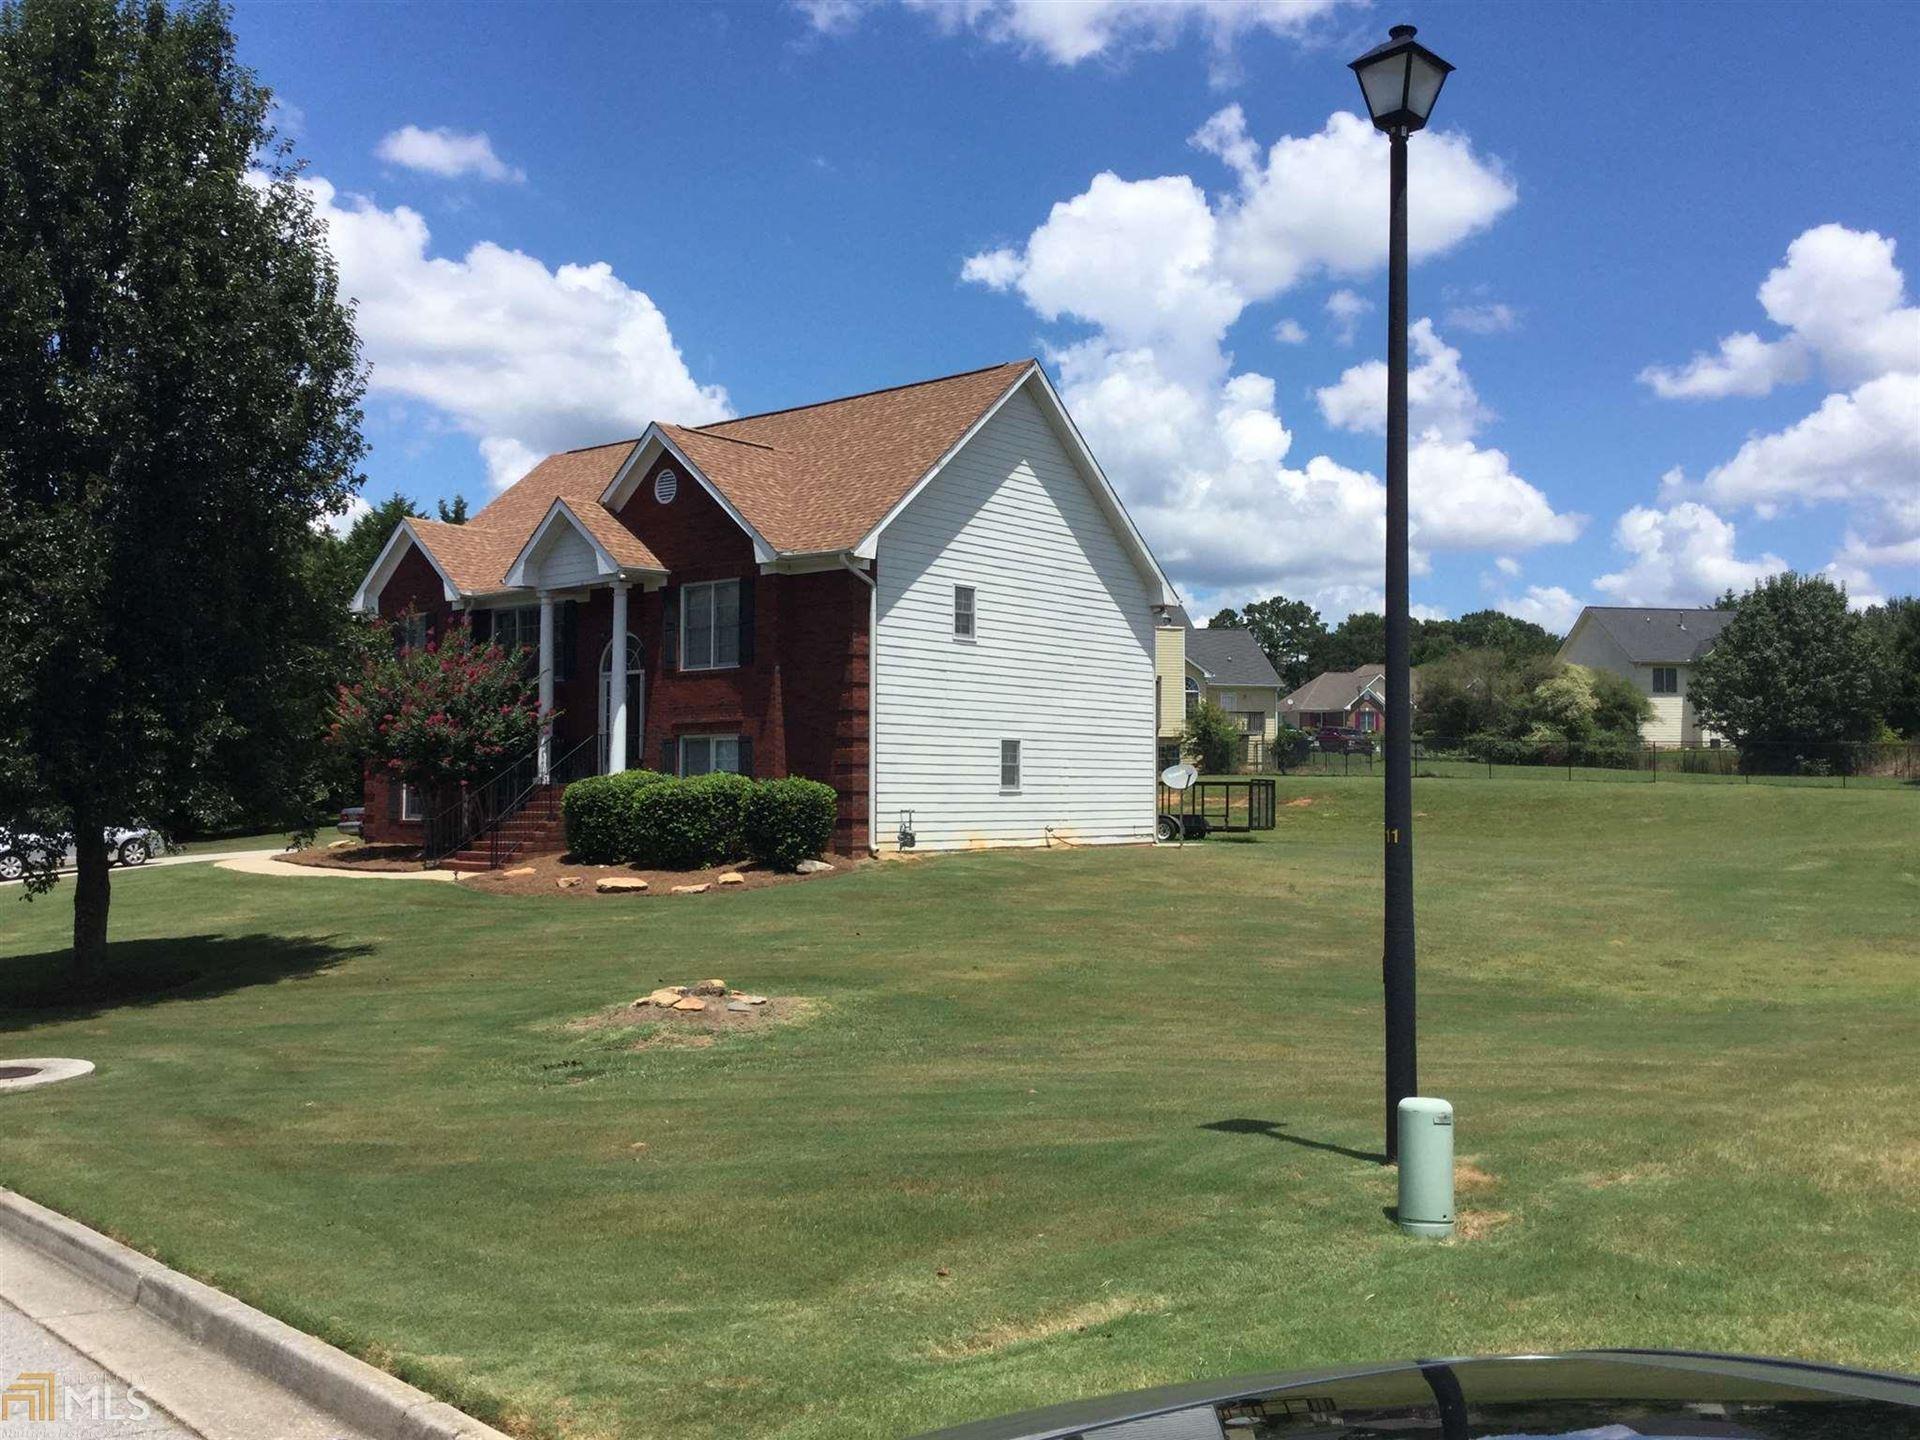 2028 Lost Meadows Ln, Conyers, GA 30094 - MLS#: 8828887